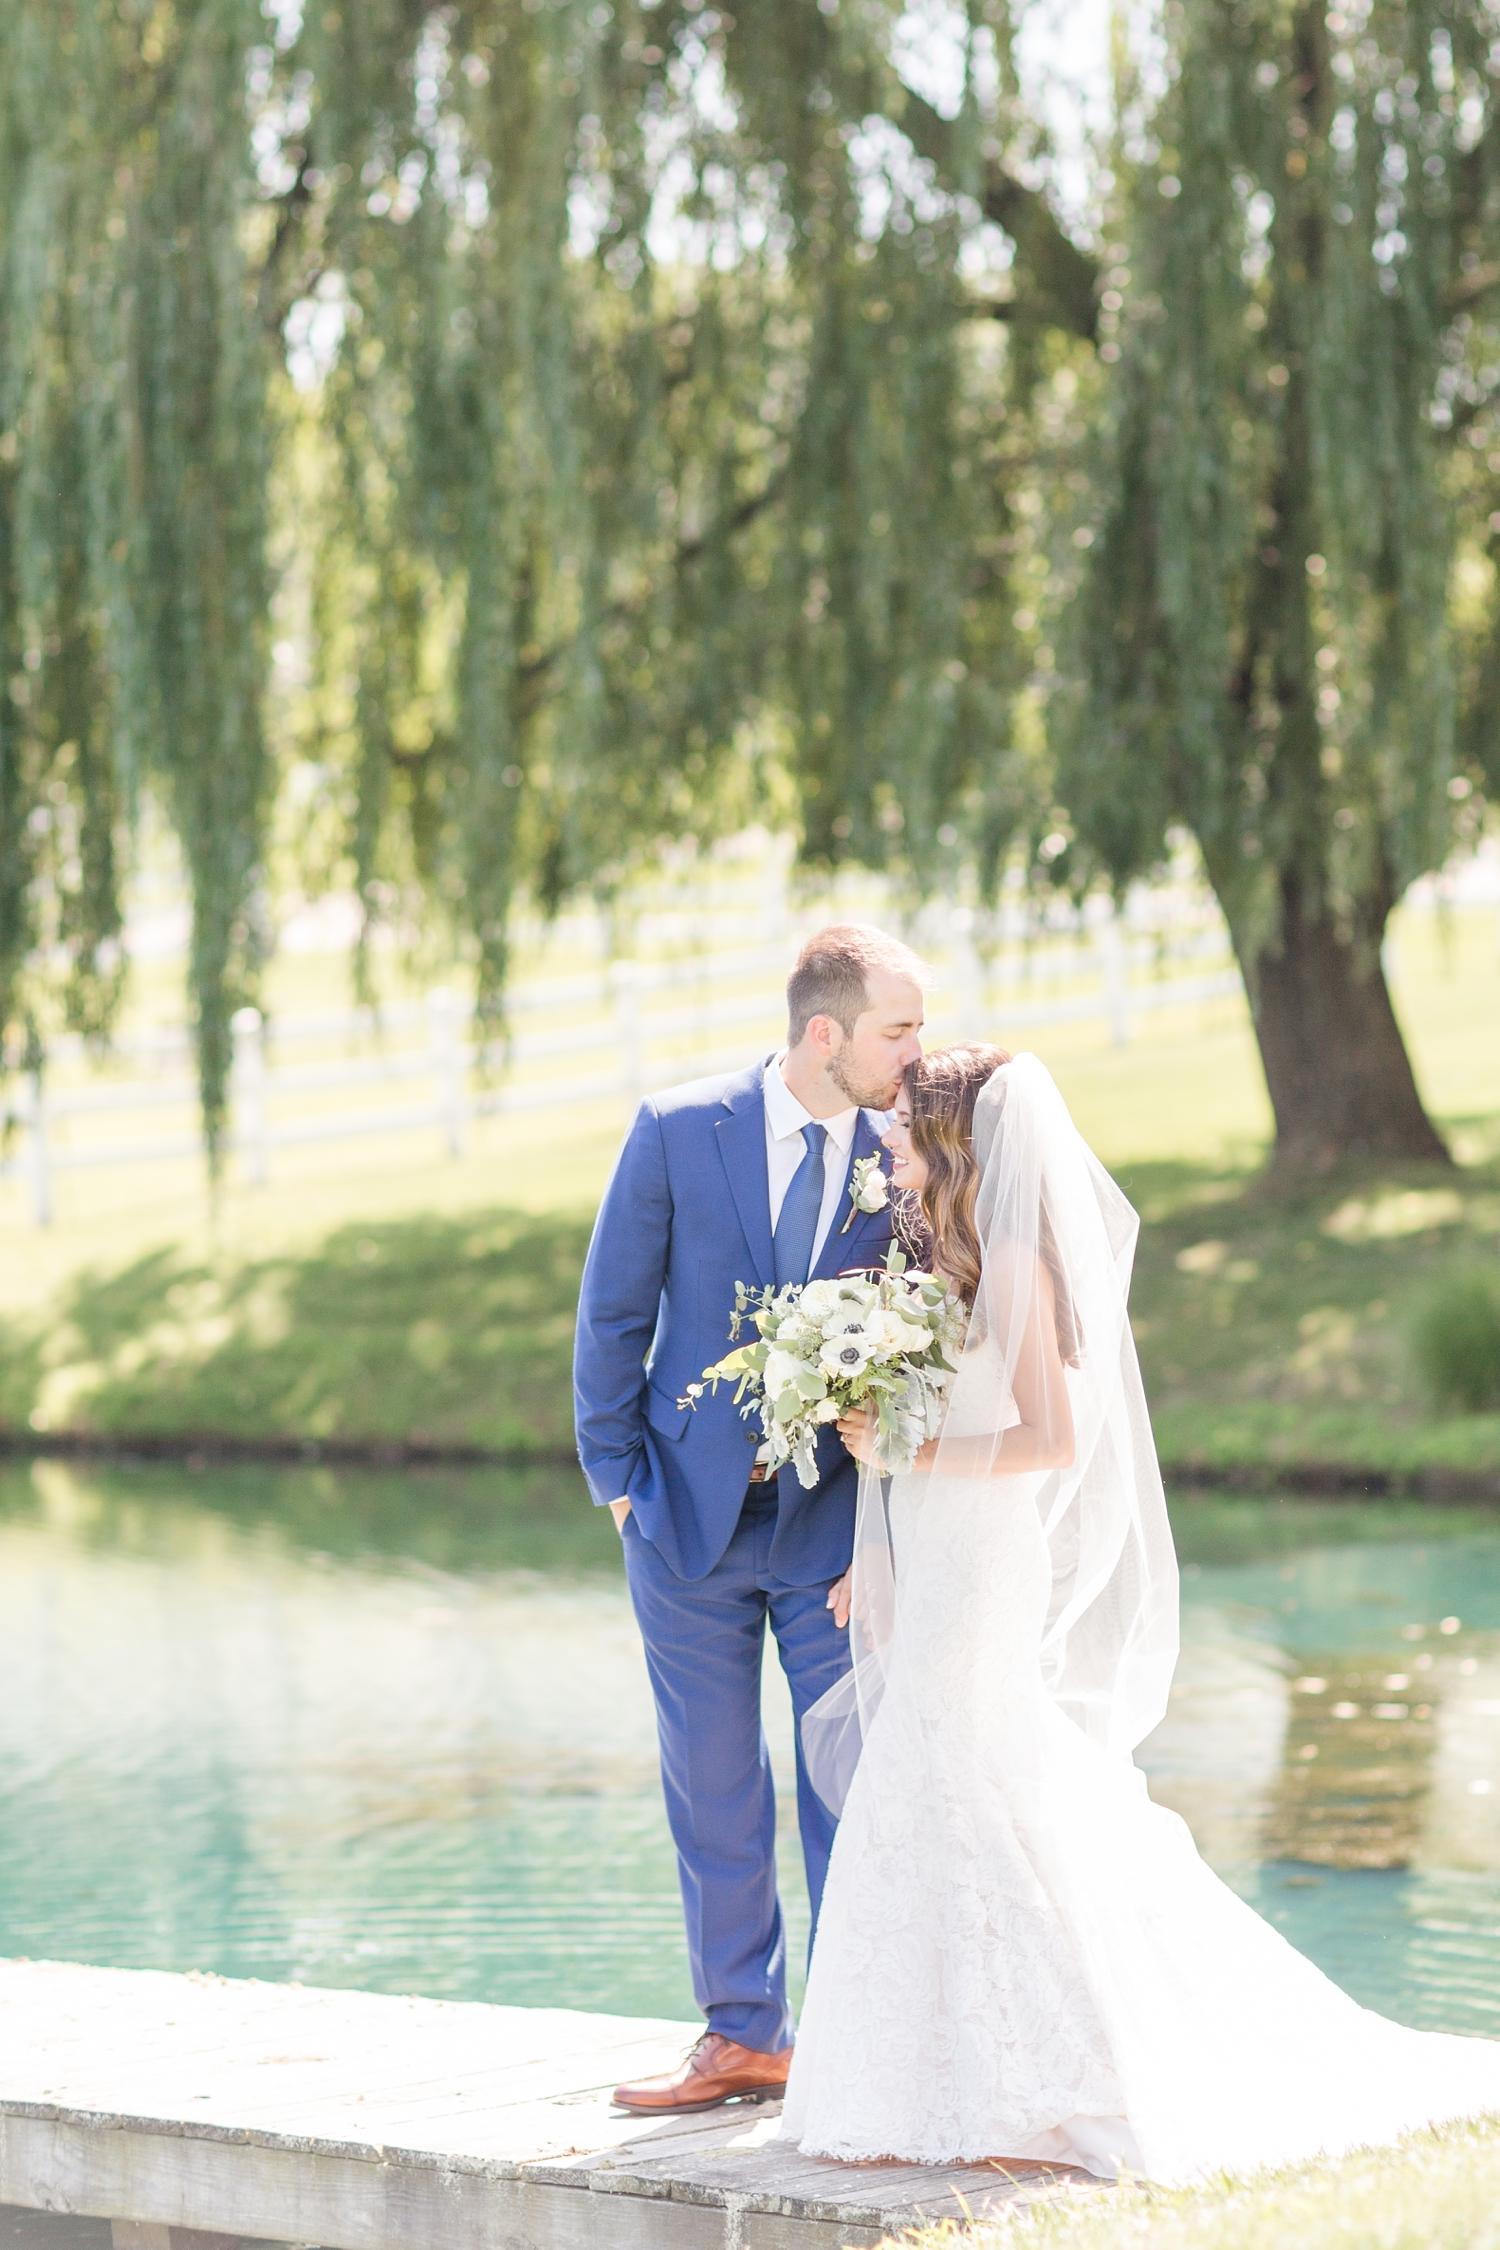 Webb WEDDING HIGHLIGHTS-159_Pond-View-Farm-wedding-Maryland-wedding-photographer-anna-grace-photography-photo.jpg